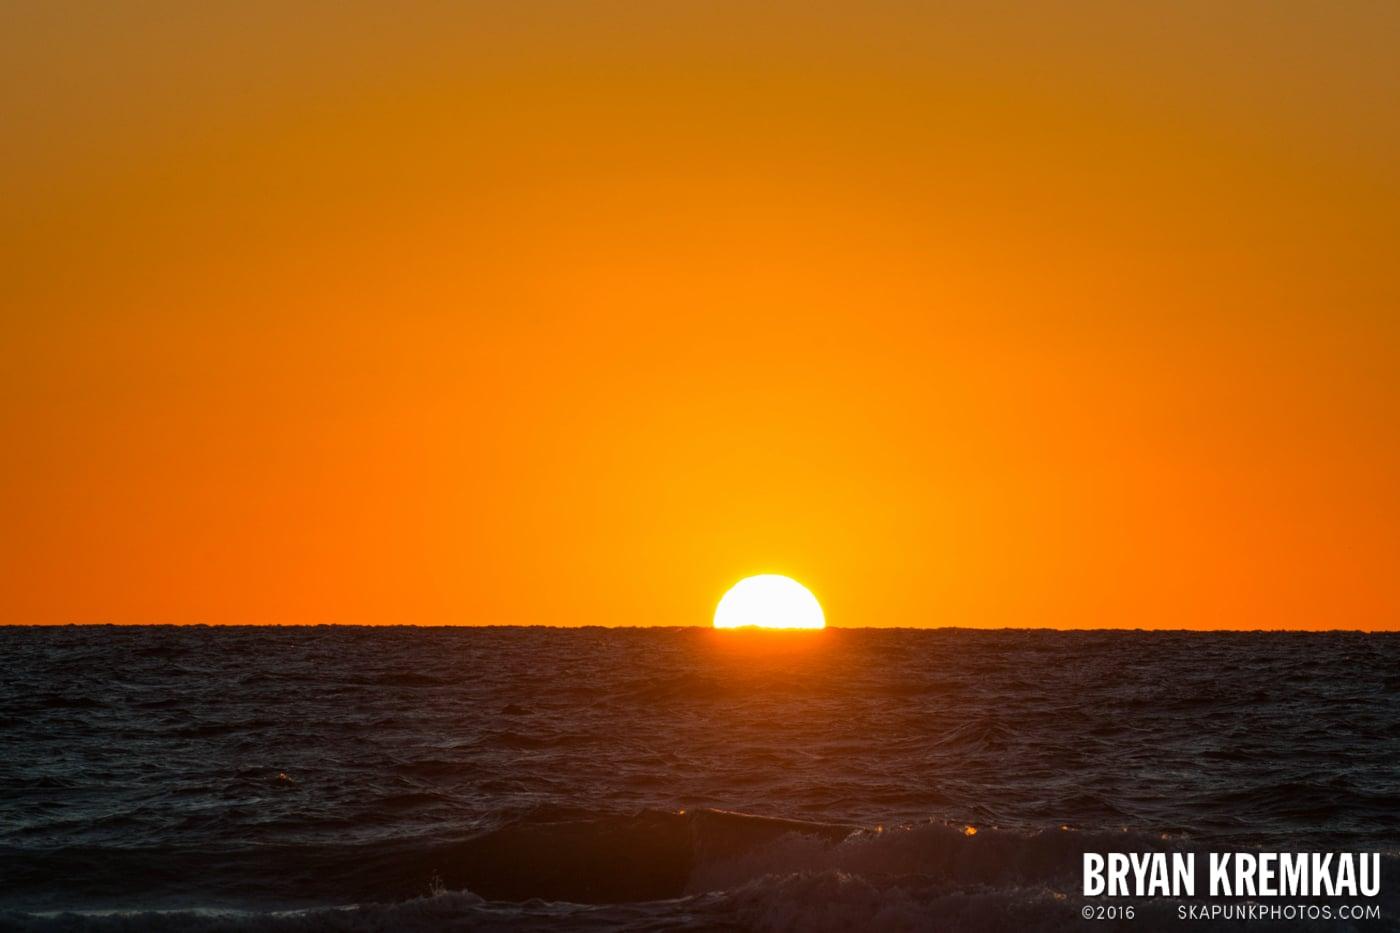 Sunsets, Astrophotography & Birds @ Venice, Florida - 10.25.14 - 11.5.14 (97)